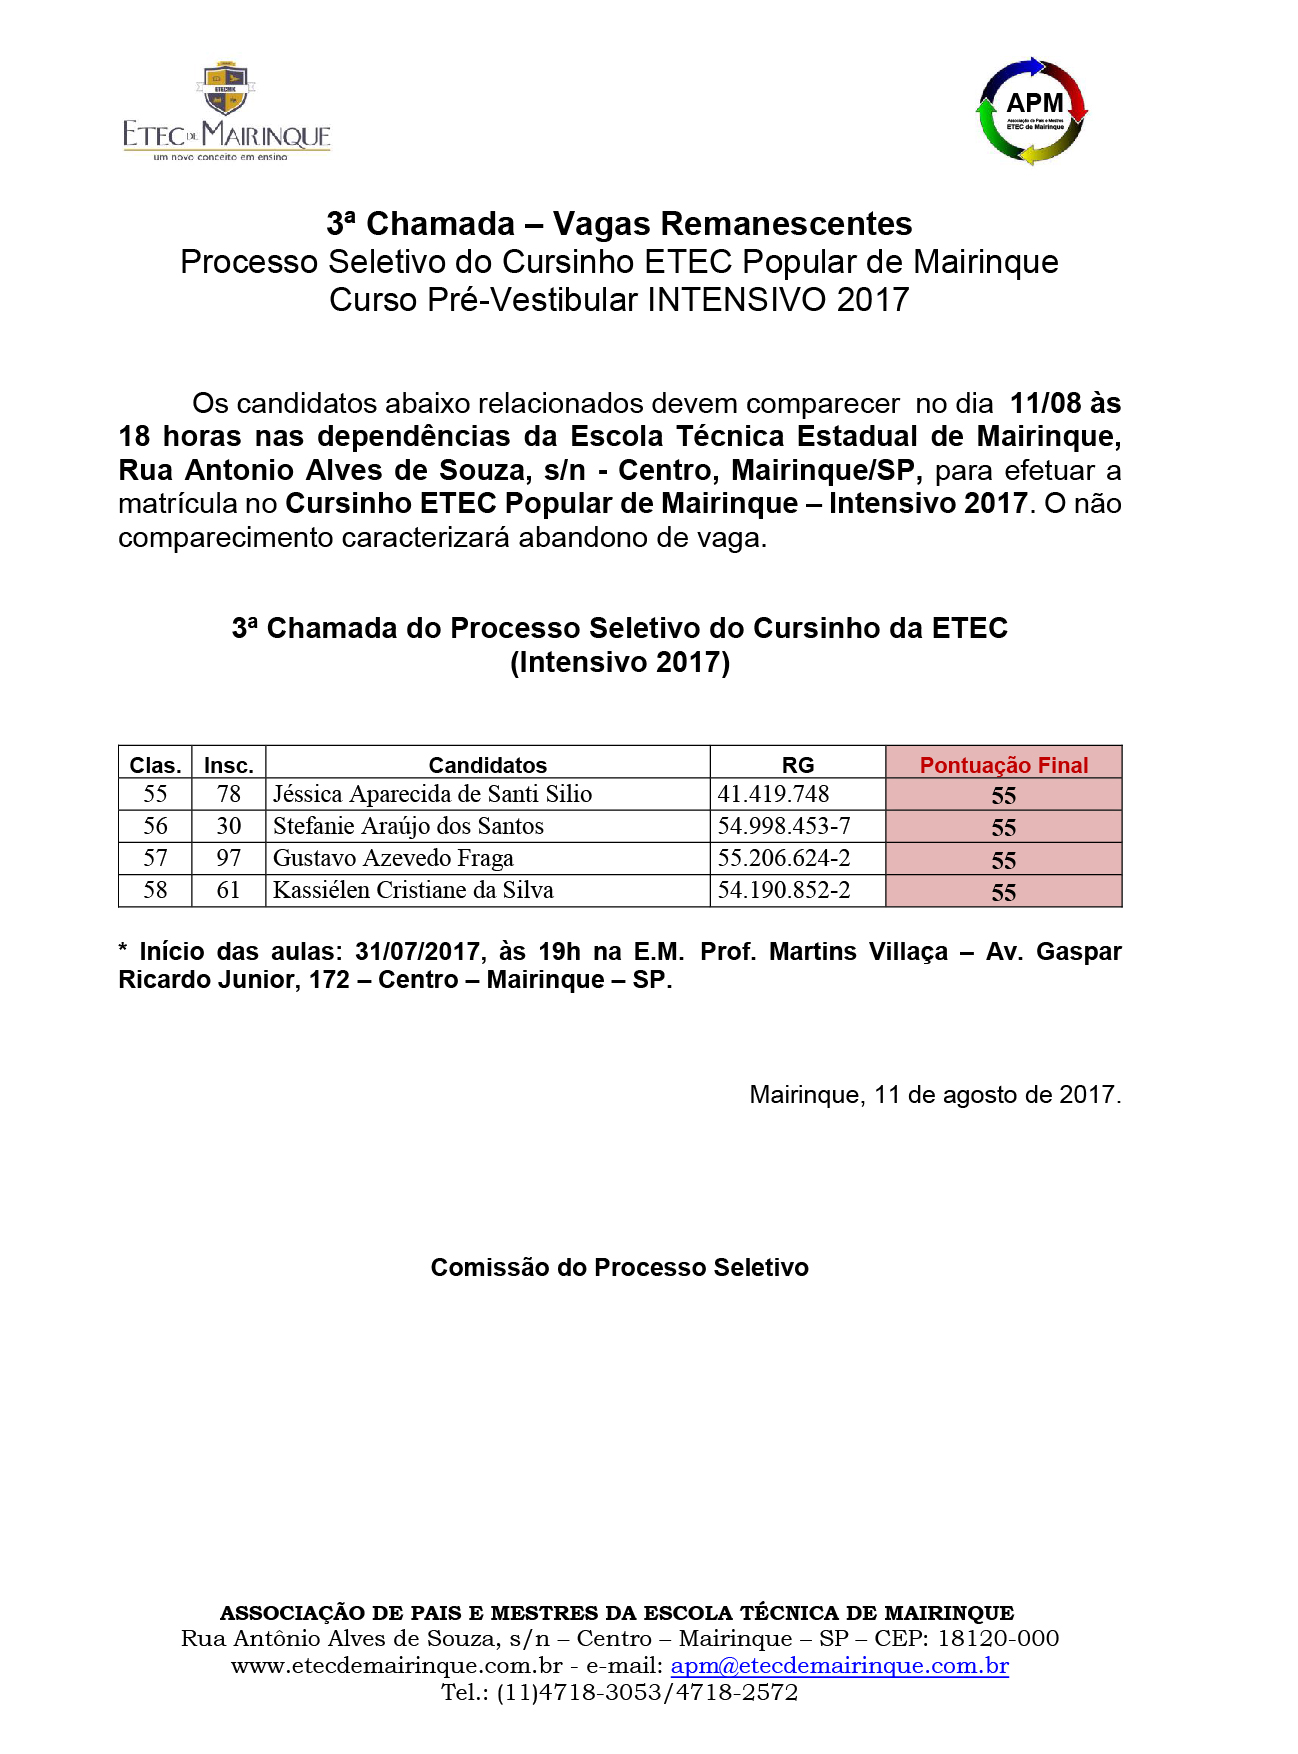 3ª Chamada - INTENSIVO 2017